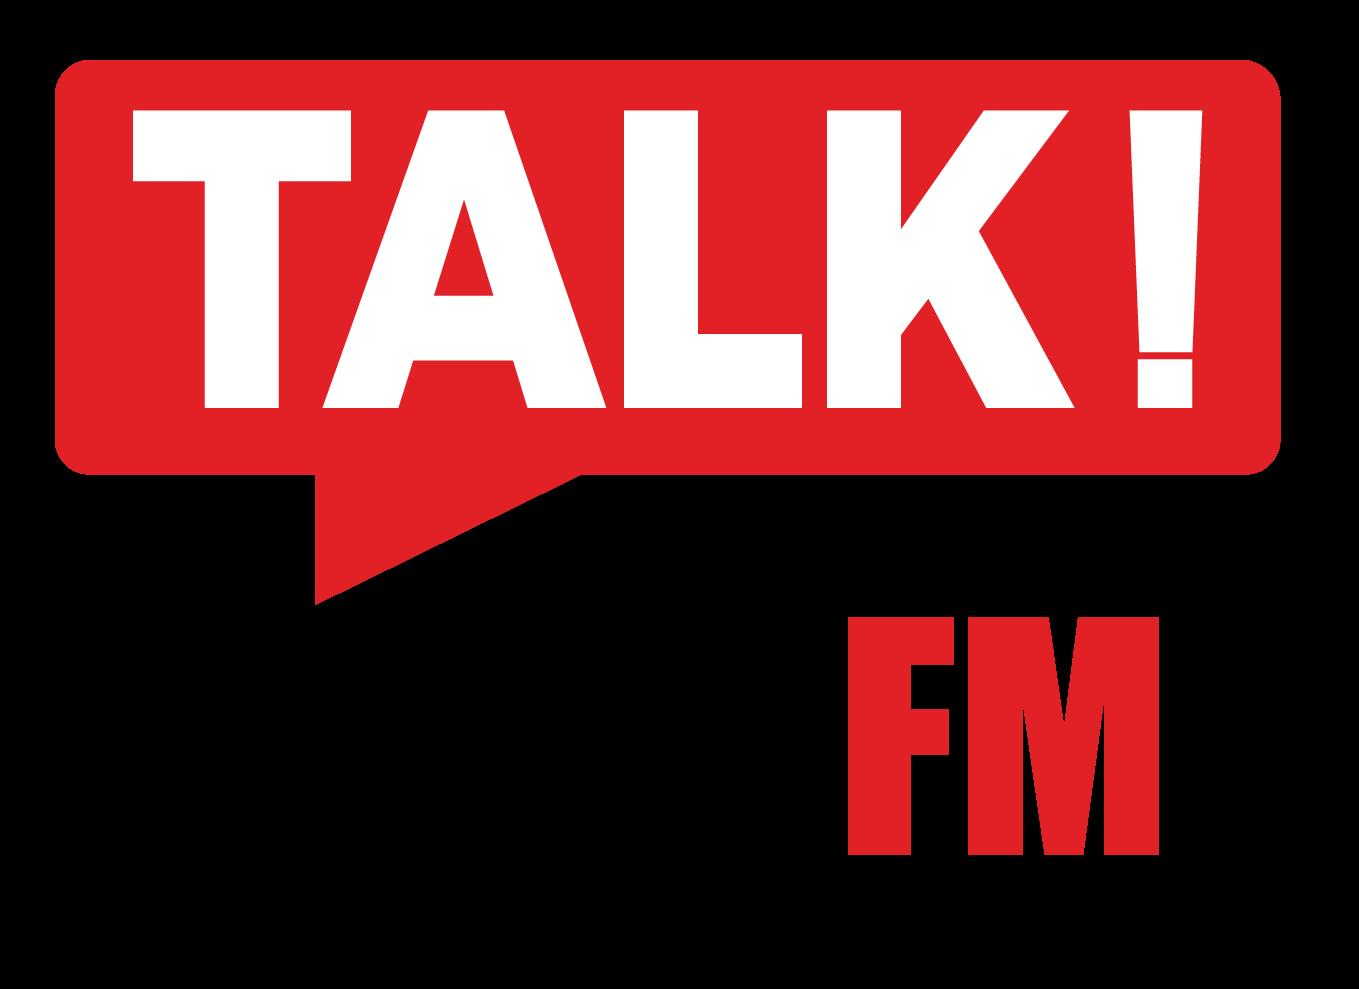 TALK! 100 7 FM - Open Format, Local Radio | Utica, NY News & Events